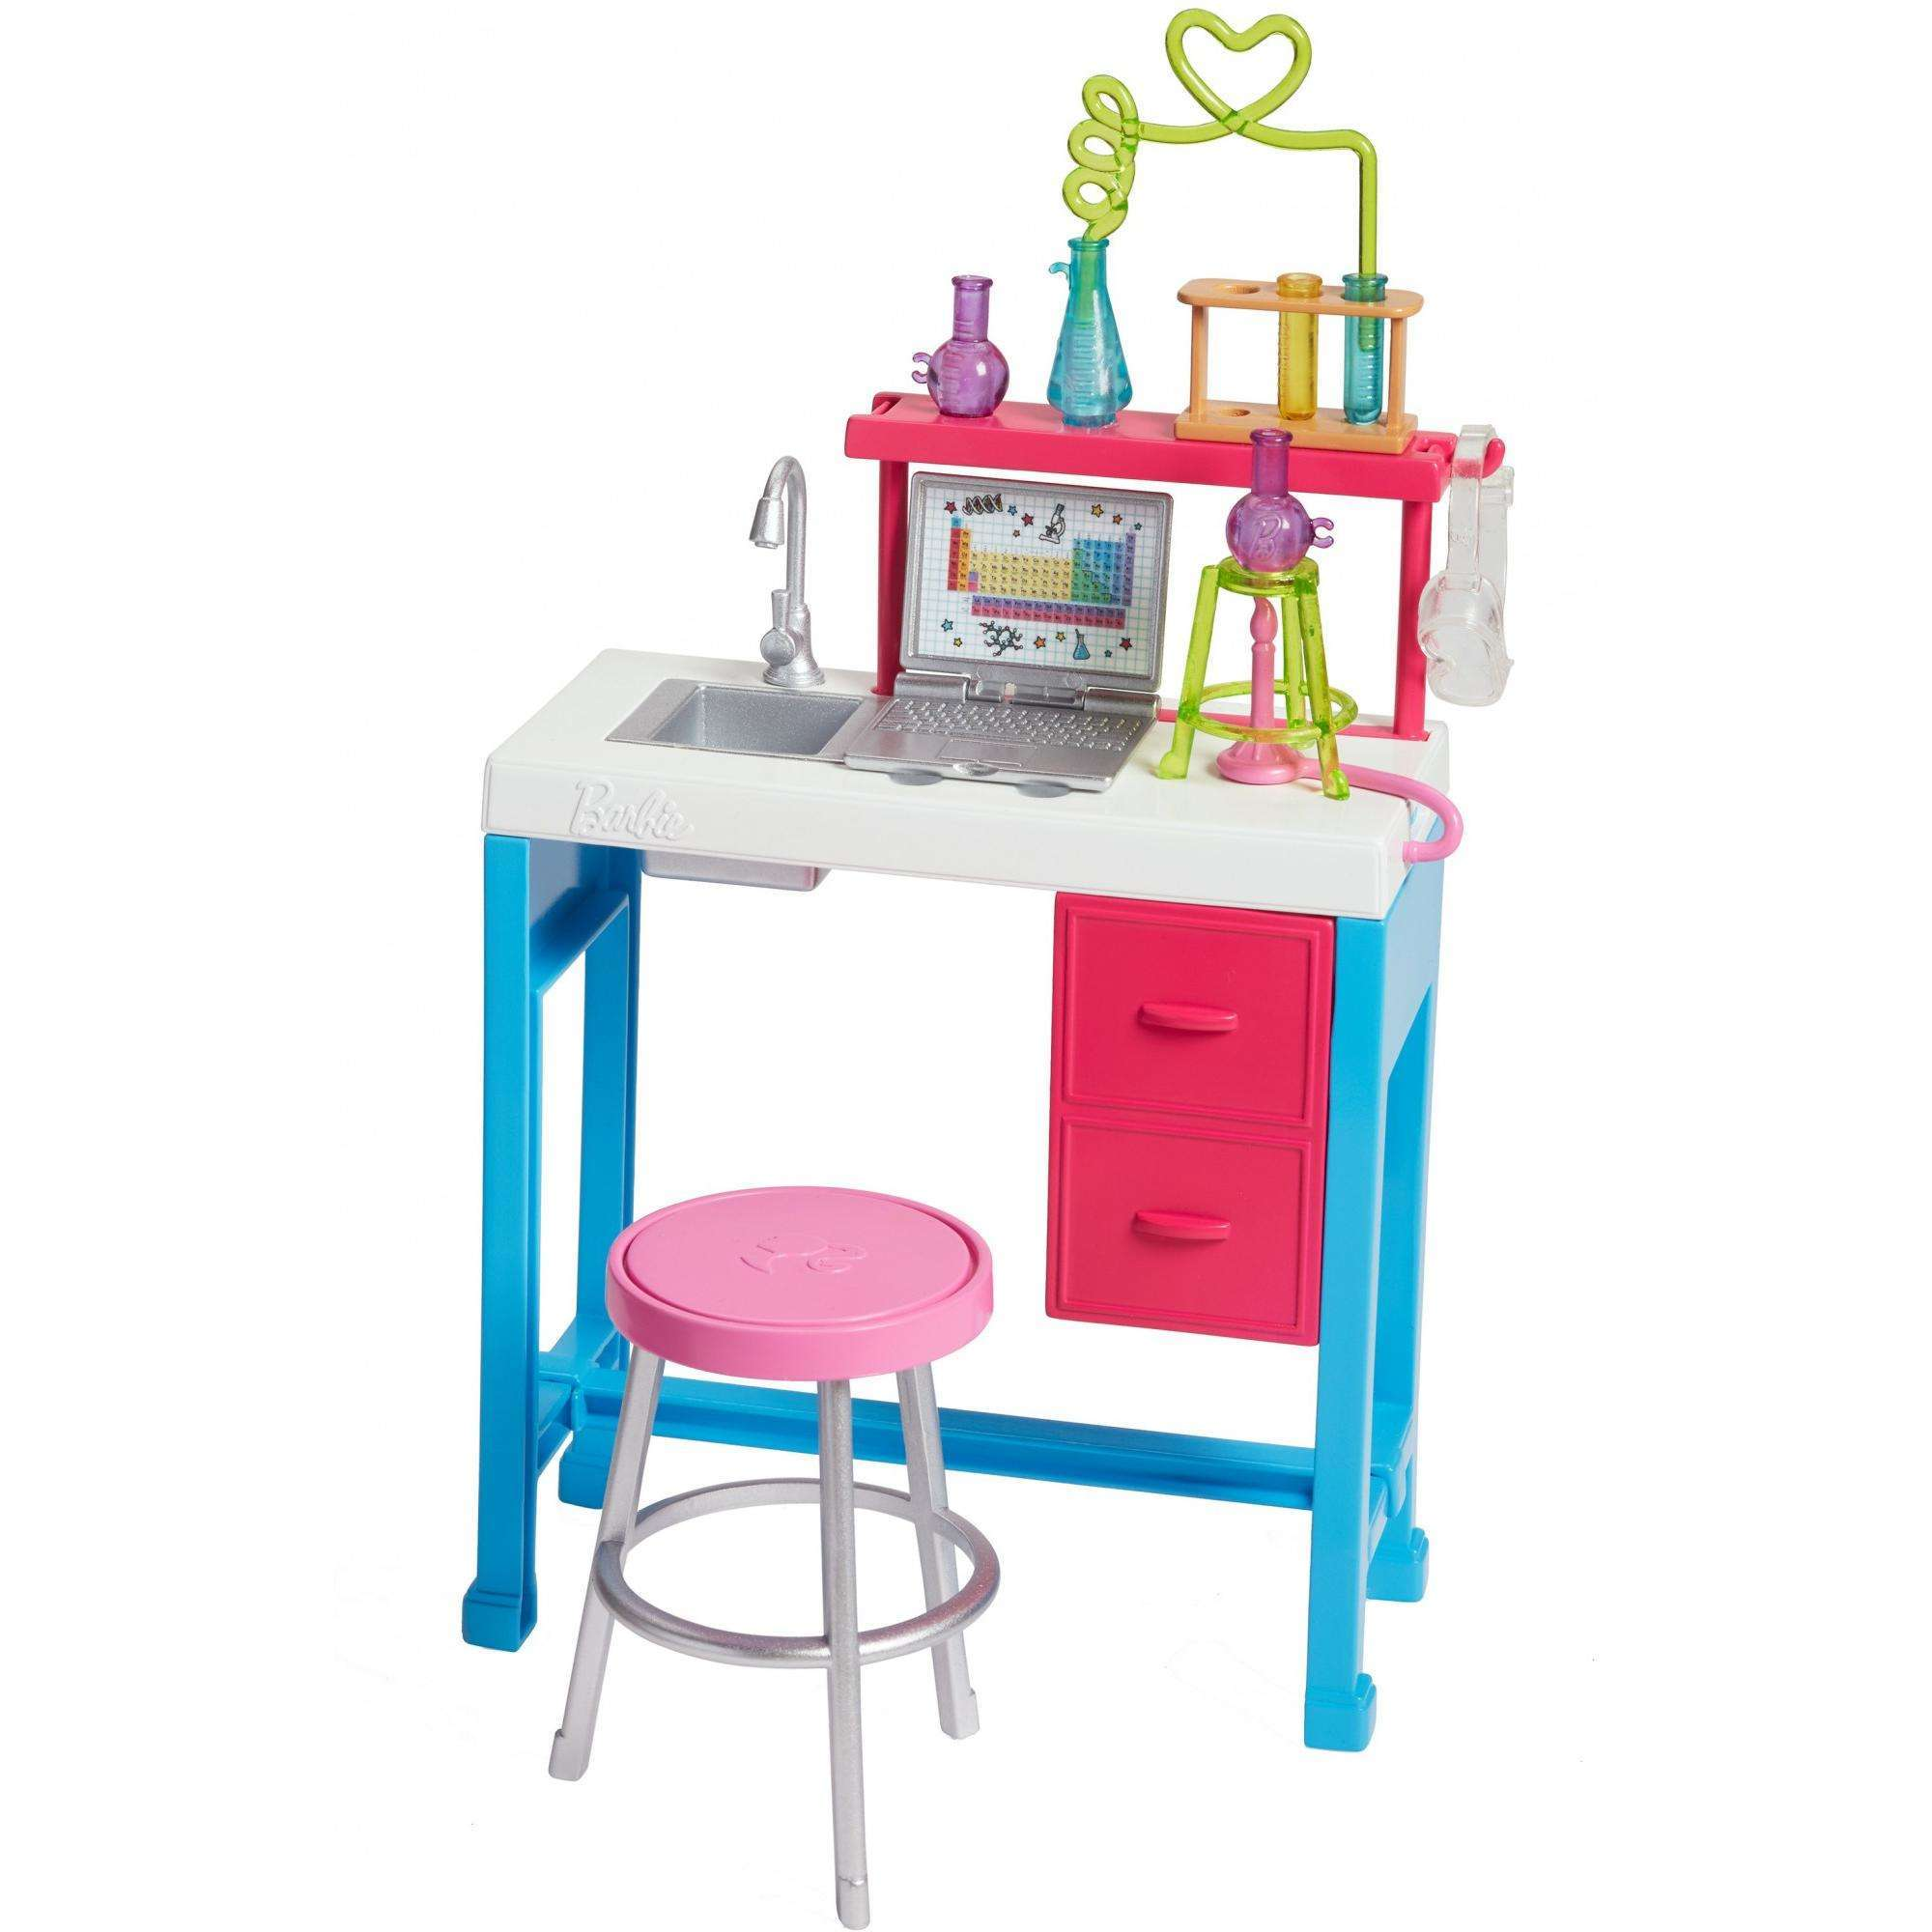 Barbie Career Science Lab Playset with Workspace Accessories